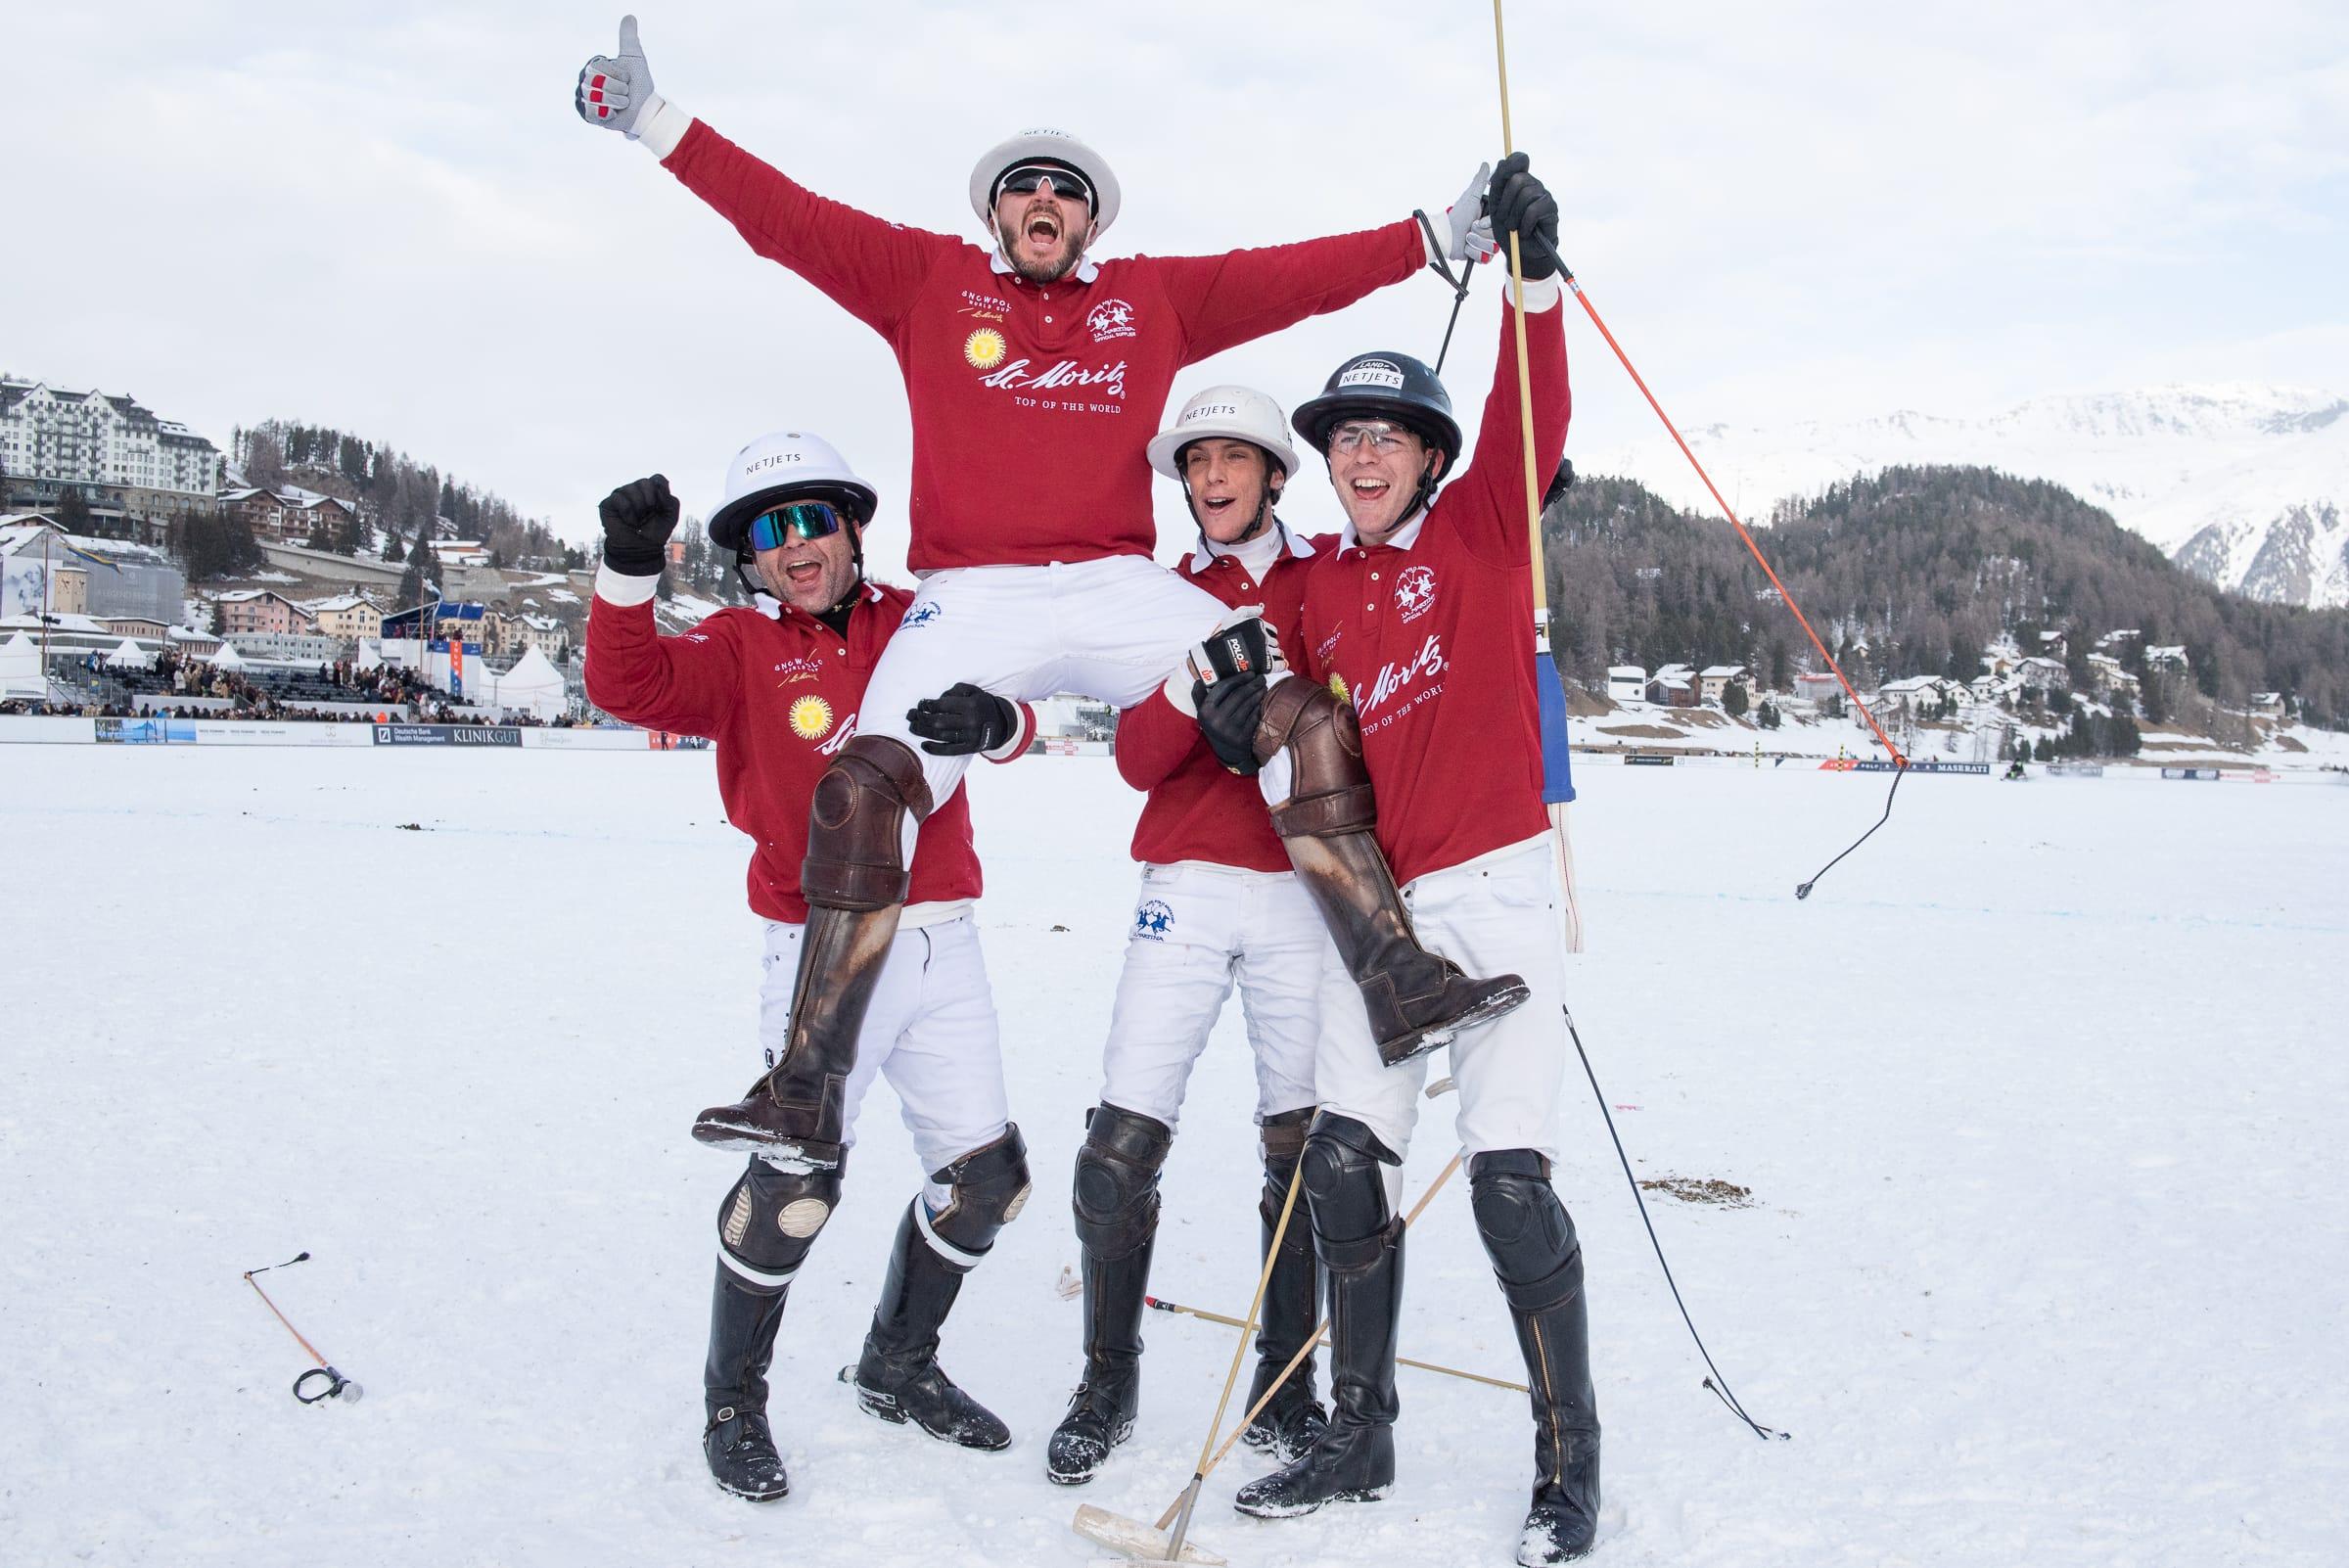 Команда St. Moritz